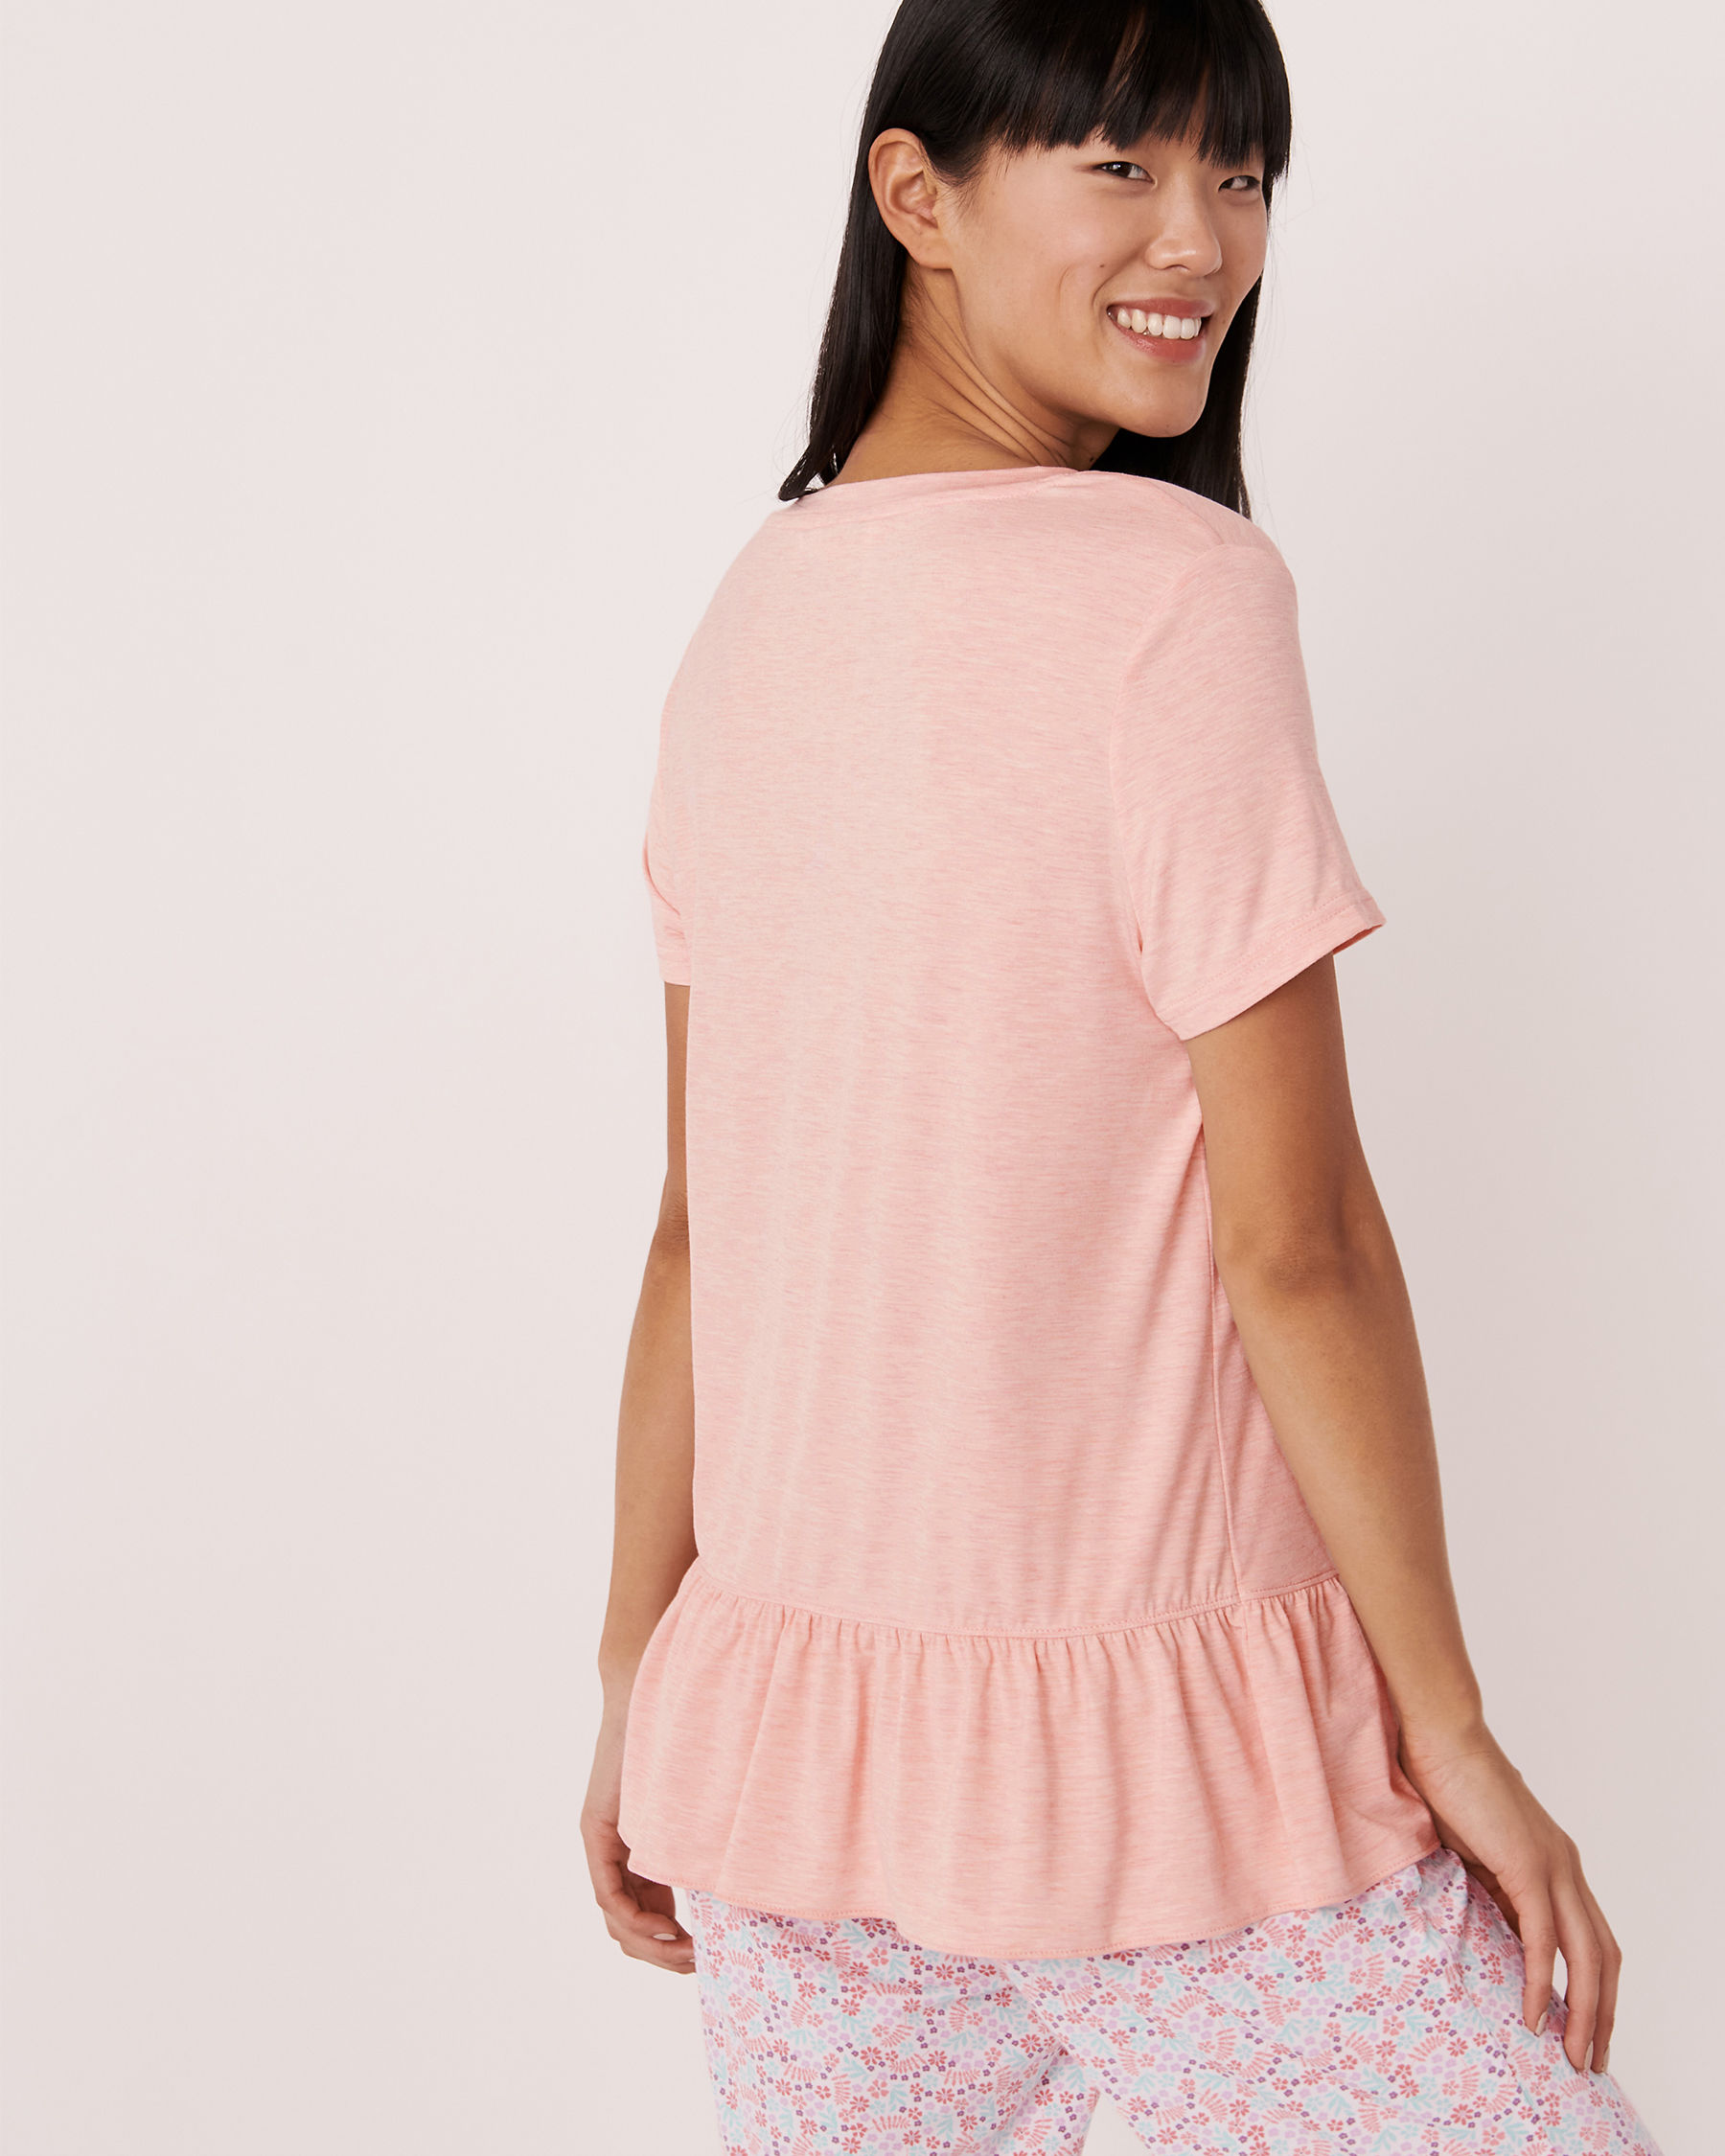 LA VIE EN ROSE Ruffle Hem T-shirt Pink mix 40100054 - View2